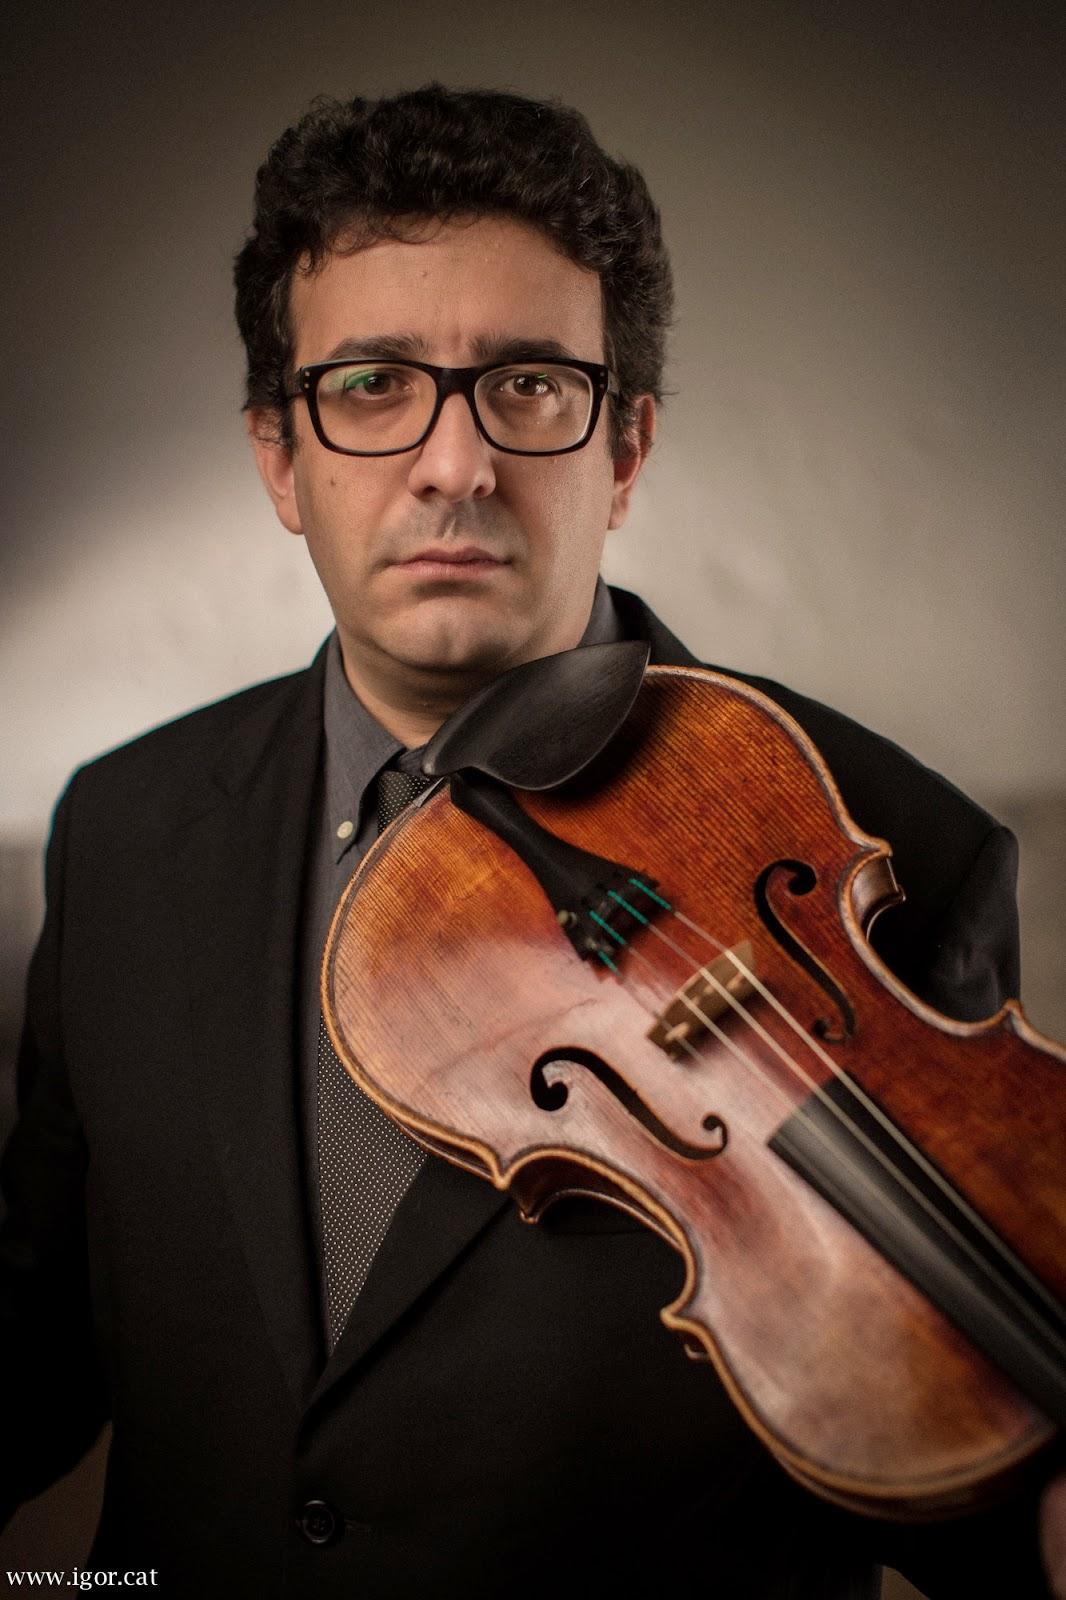 Haydn Janacek Quartet Quartet In E Flat Op 332 Joke Quartet In F Op 35 Serenade Quartet In D Minor O